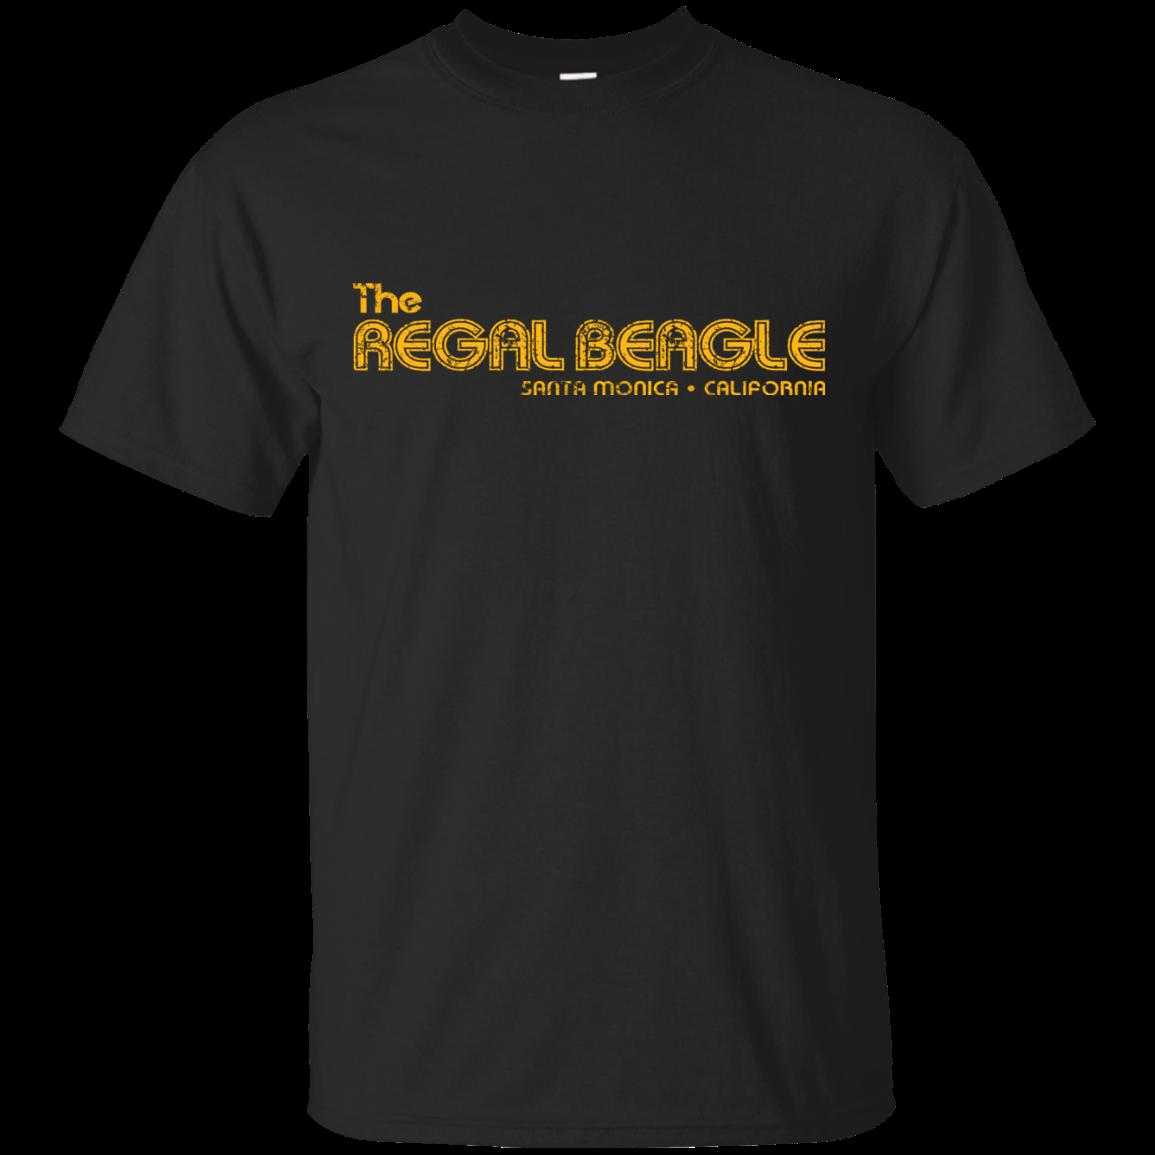 The Regal Beagle T Shirt